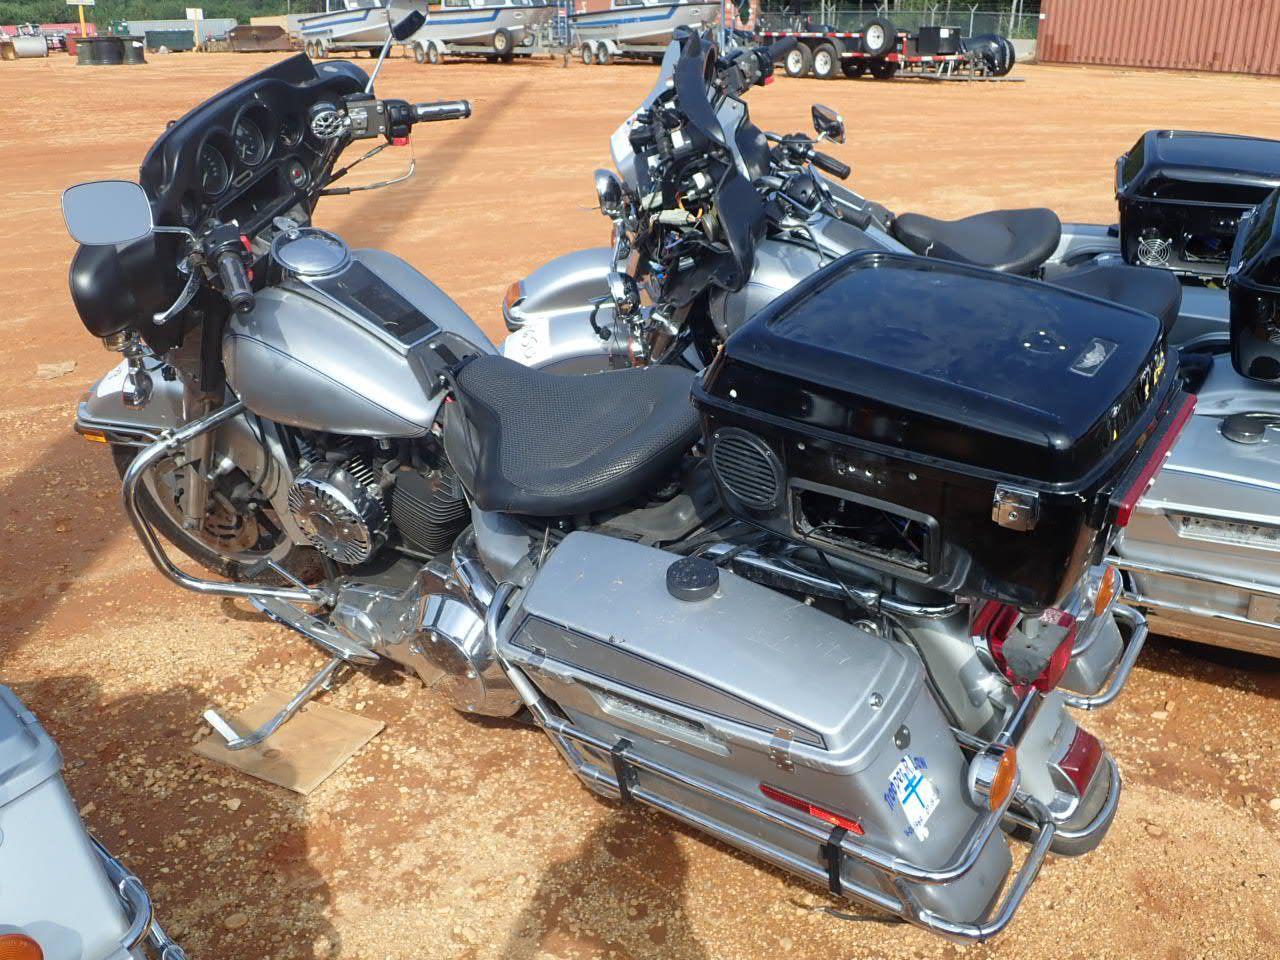 2006 HARLEY DAVIDSON MOTORCYCLE ATV / UTV / Cart - J.M